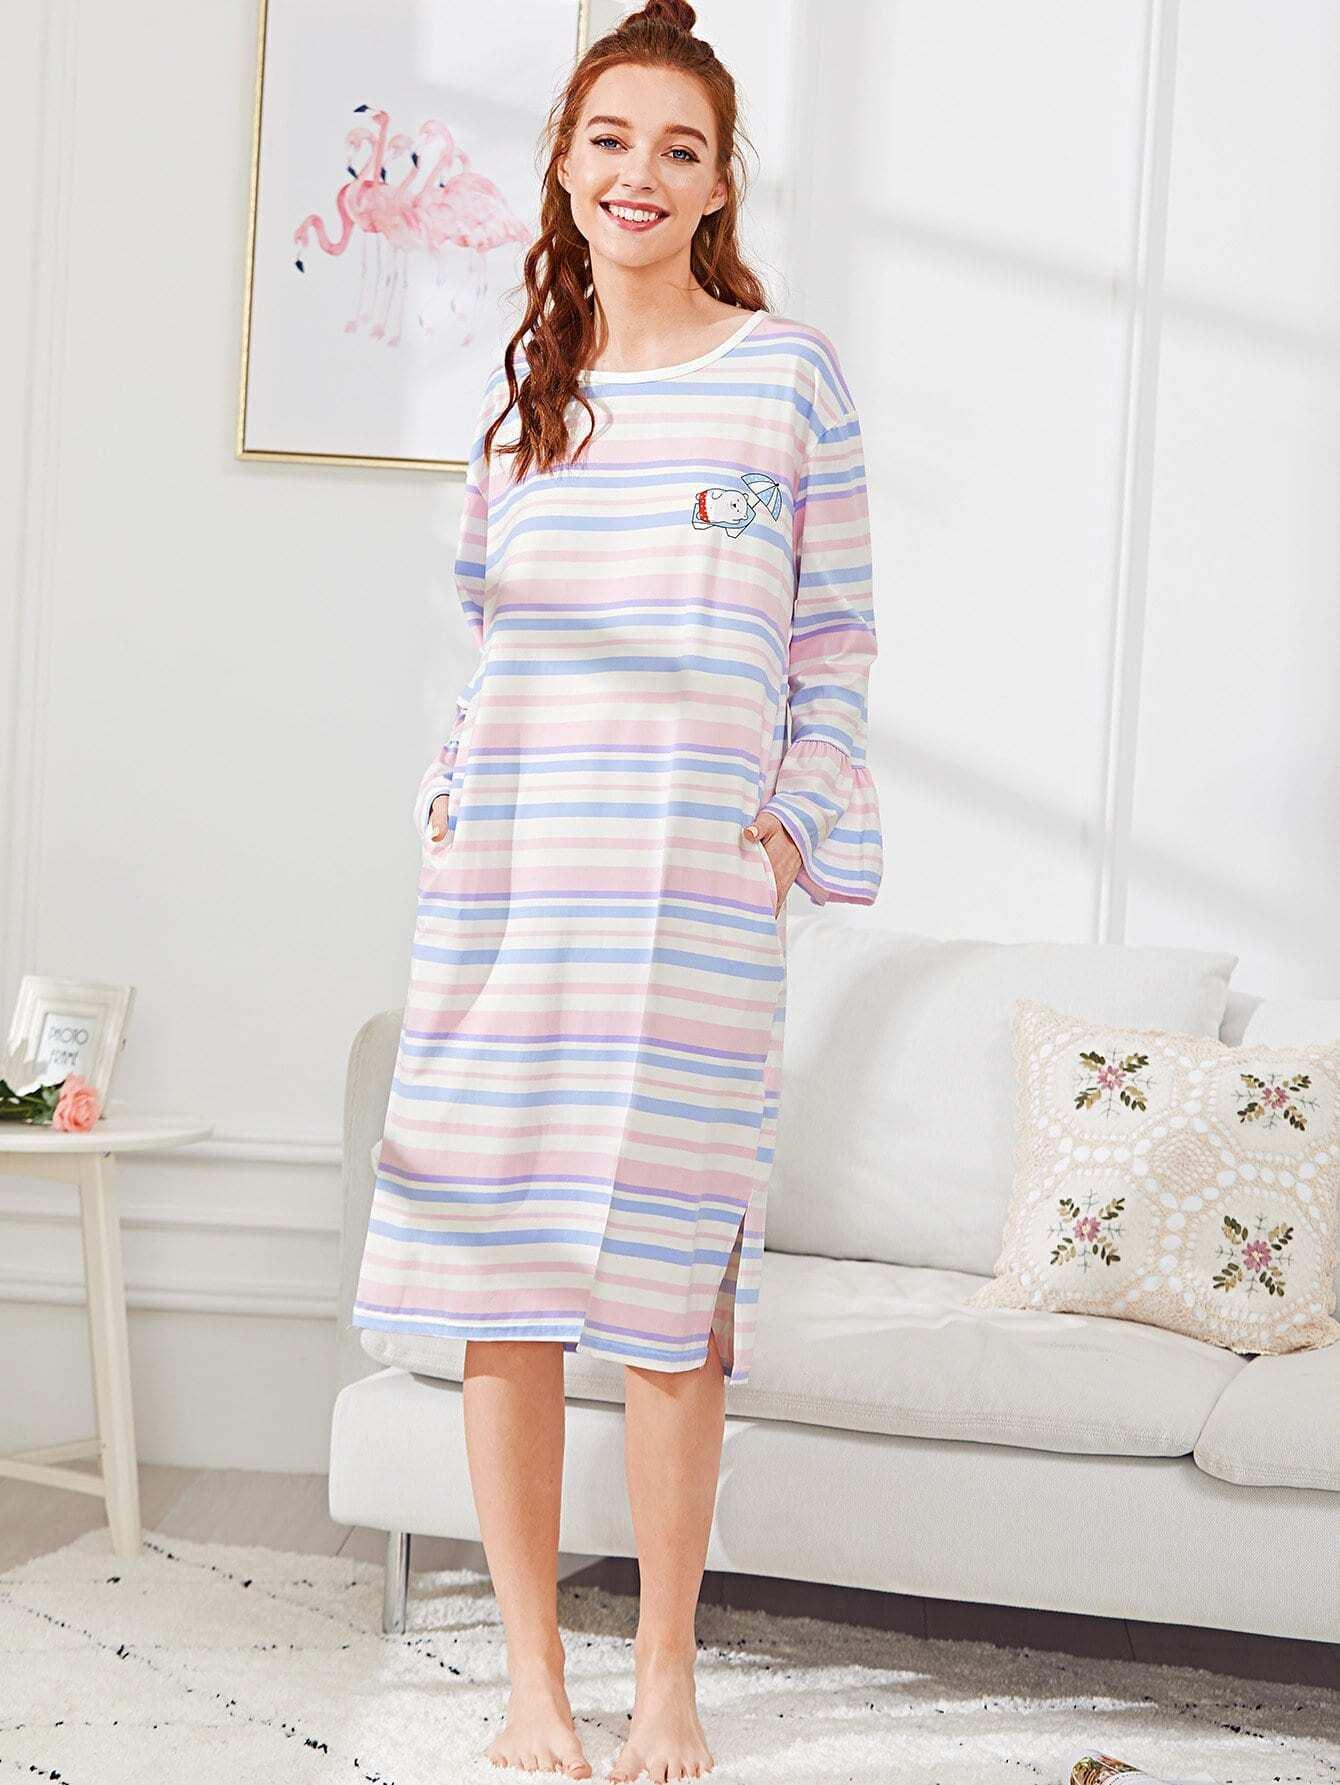 Bear Print Striped Dress exmork 100 вт 12 в poly si